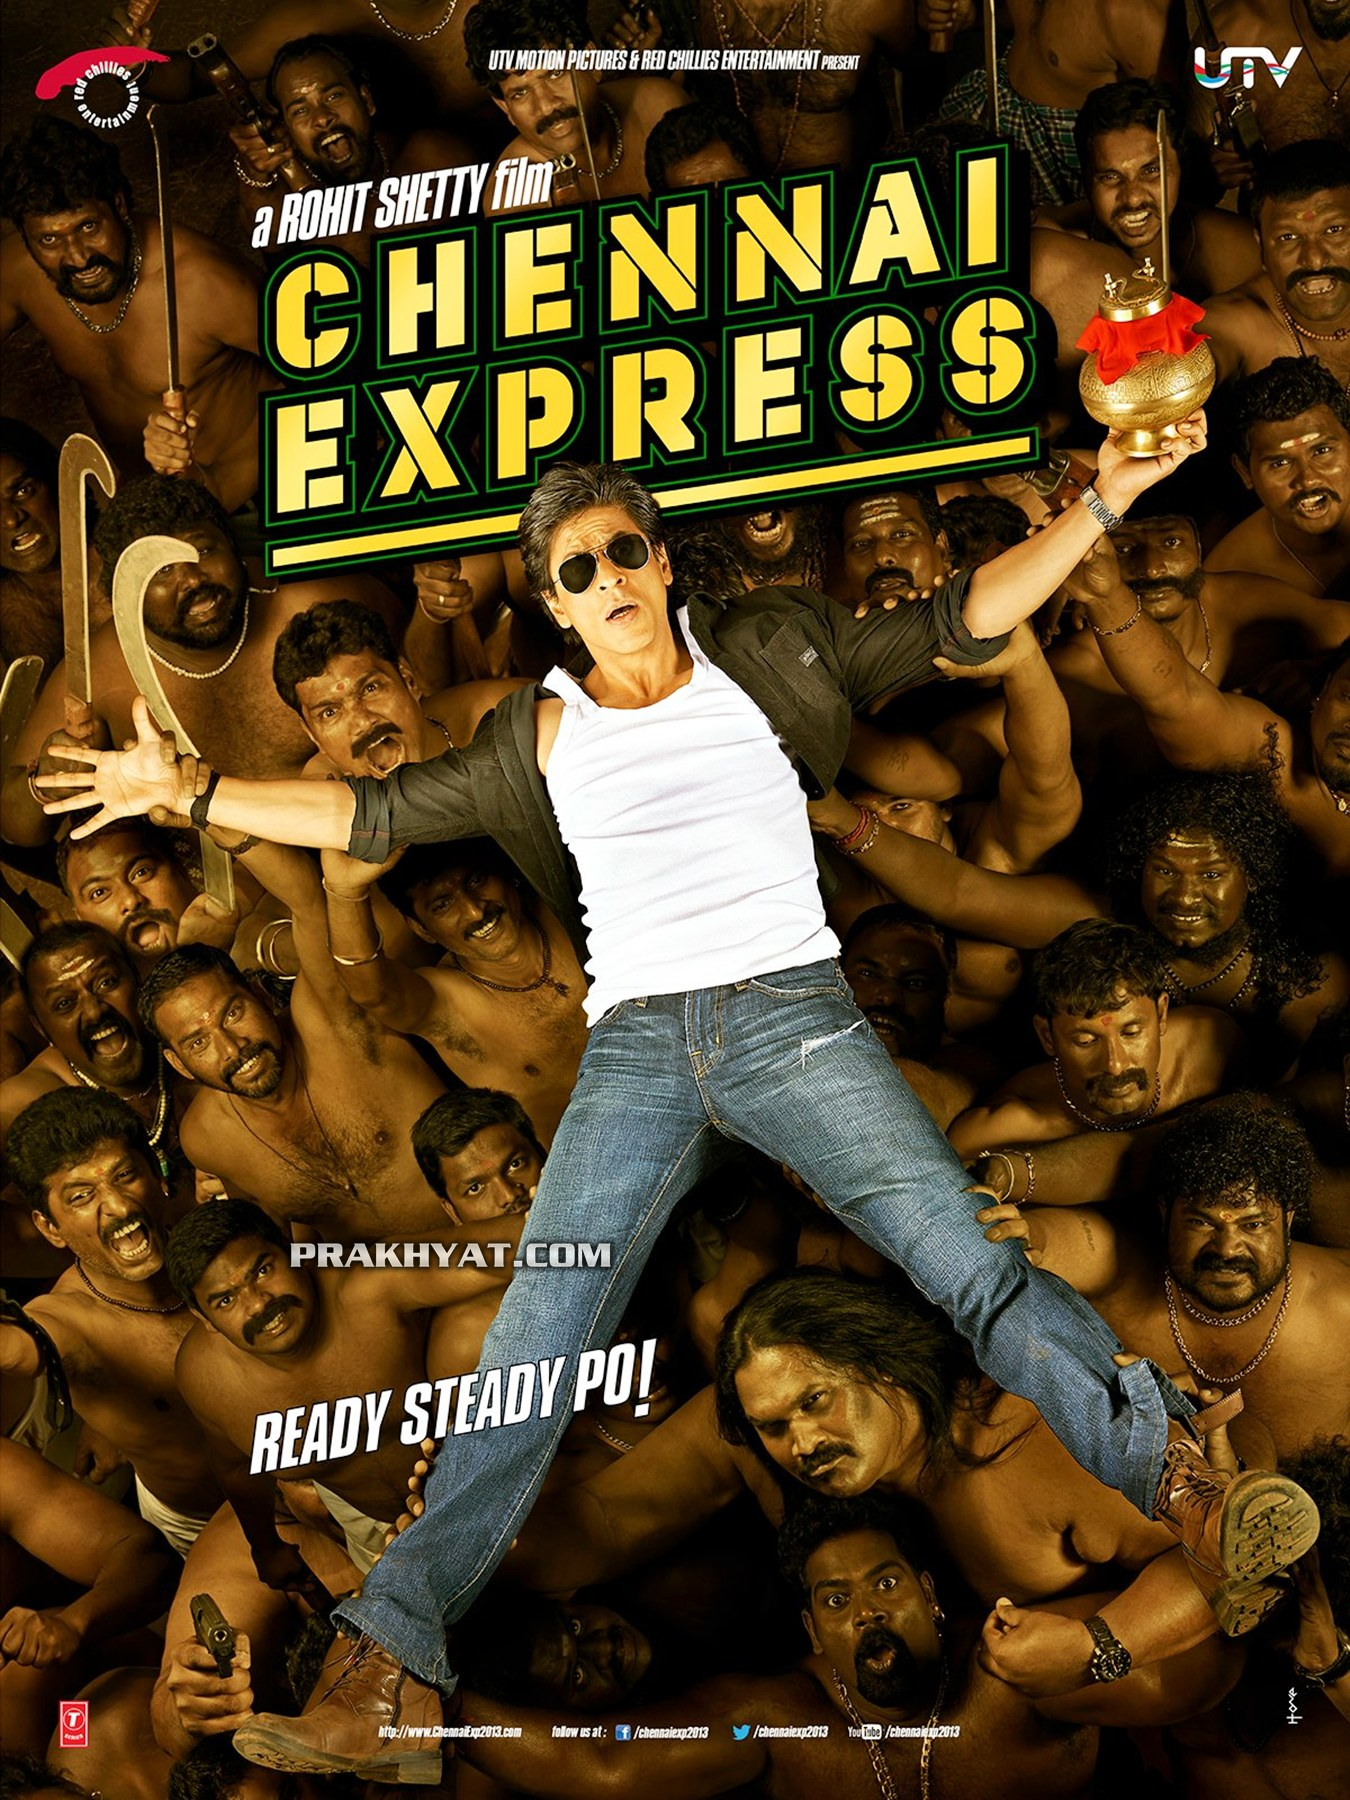 Chennai Express HD Wallpapers | ANDROID WORLD